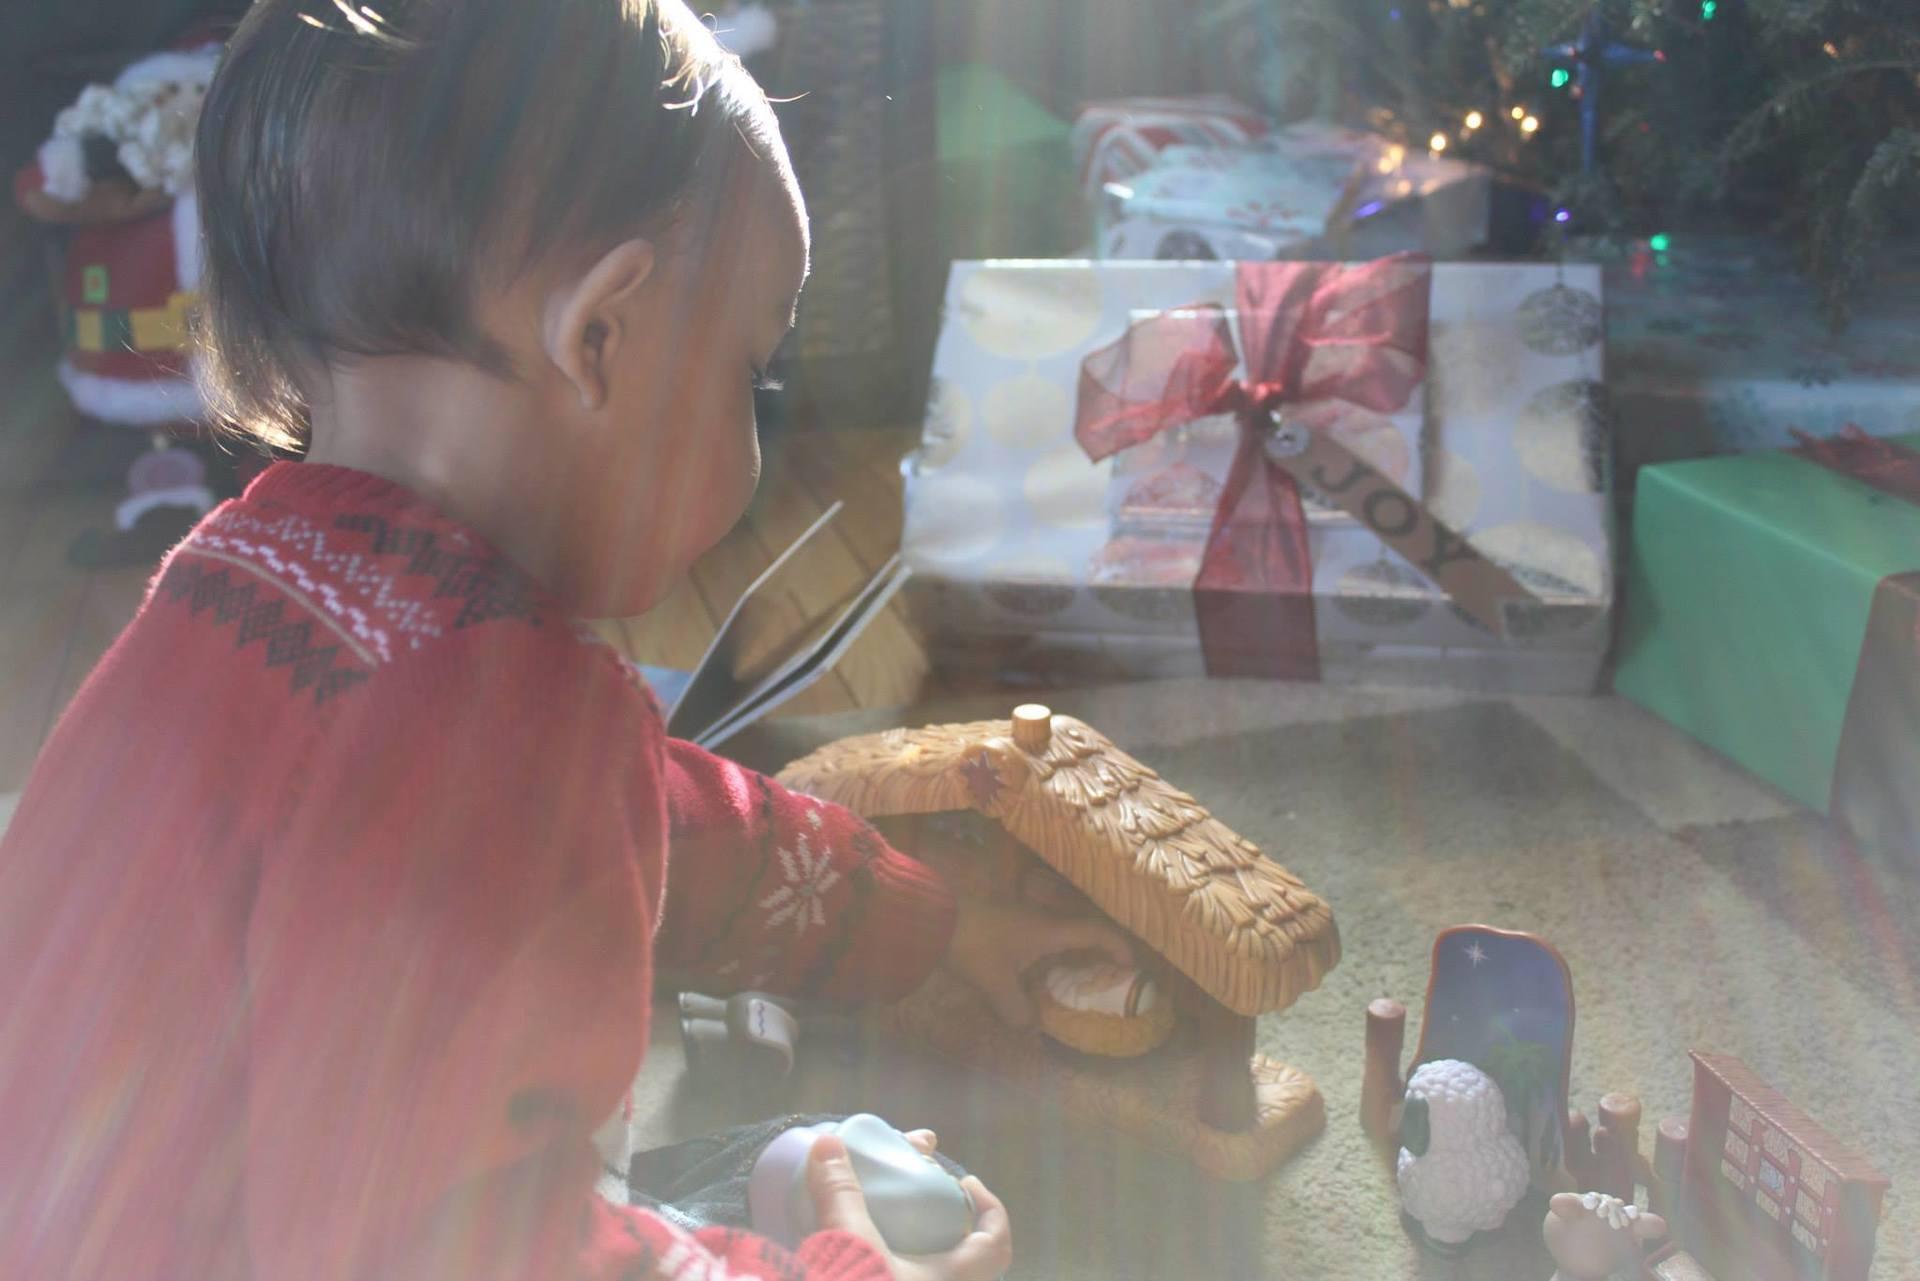 gettingreadyforchristmass